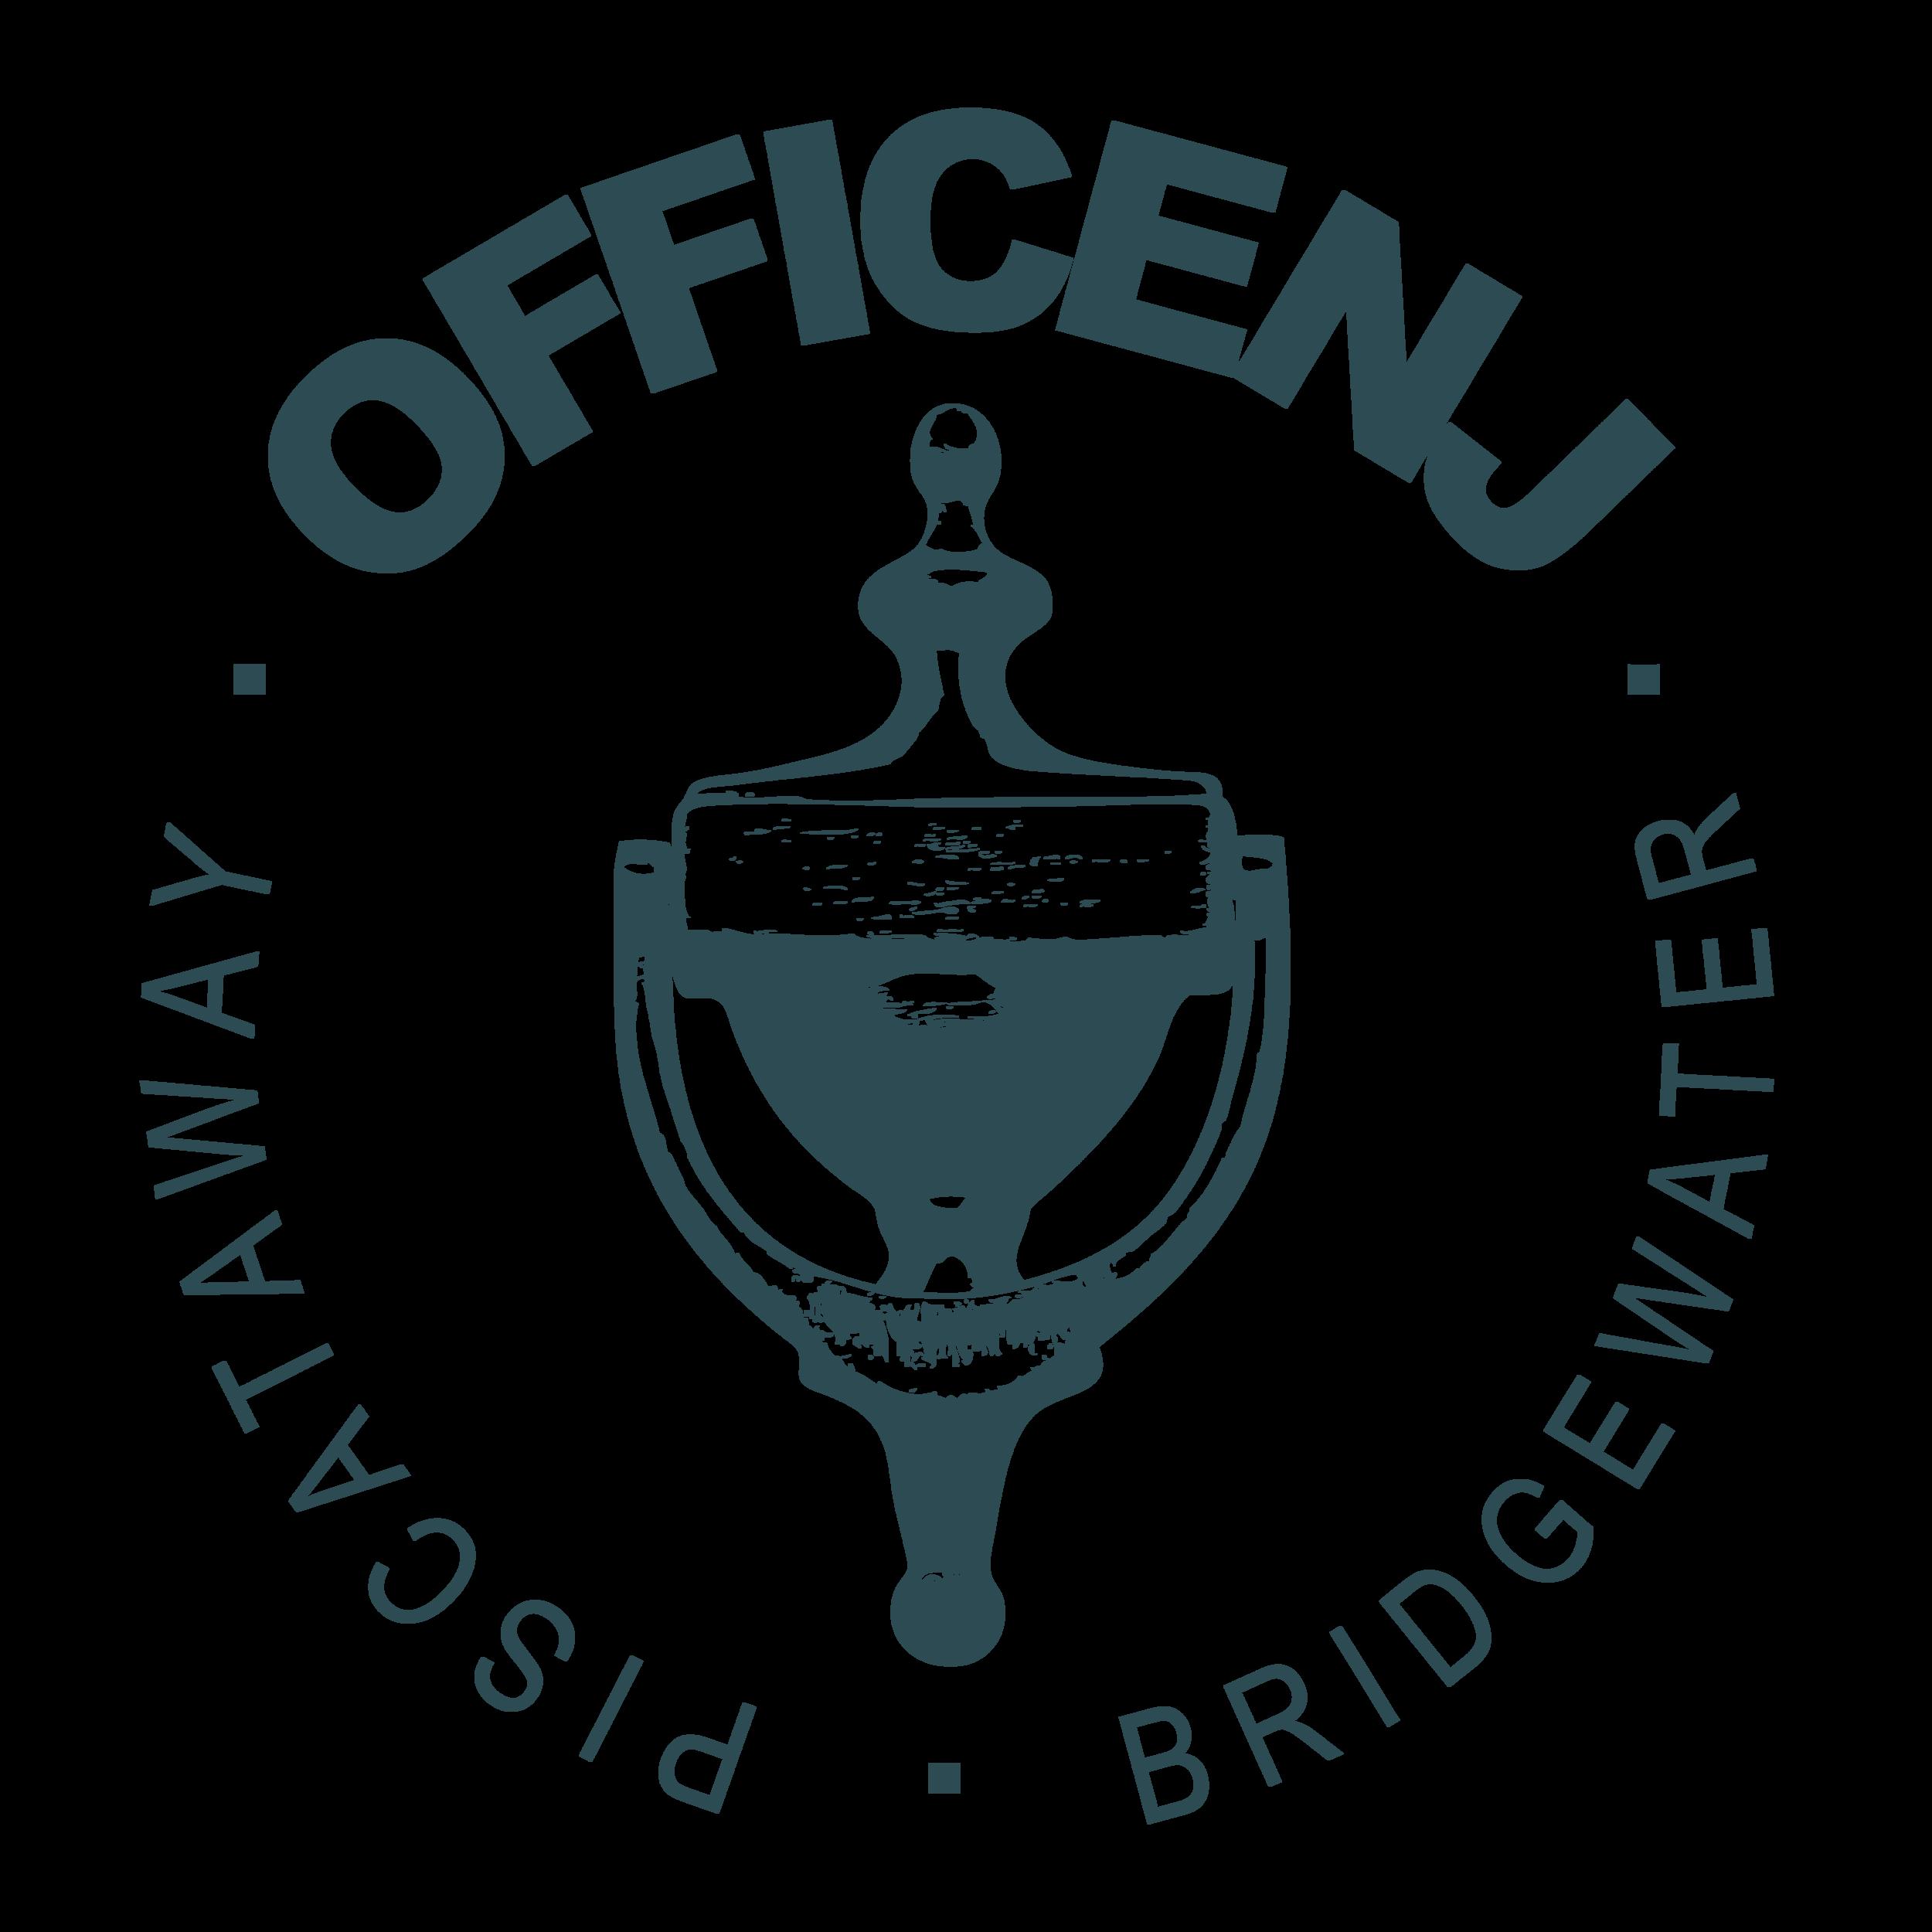 ONJ_logo_2c4b53.png